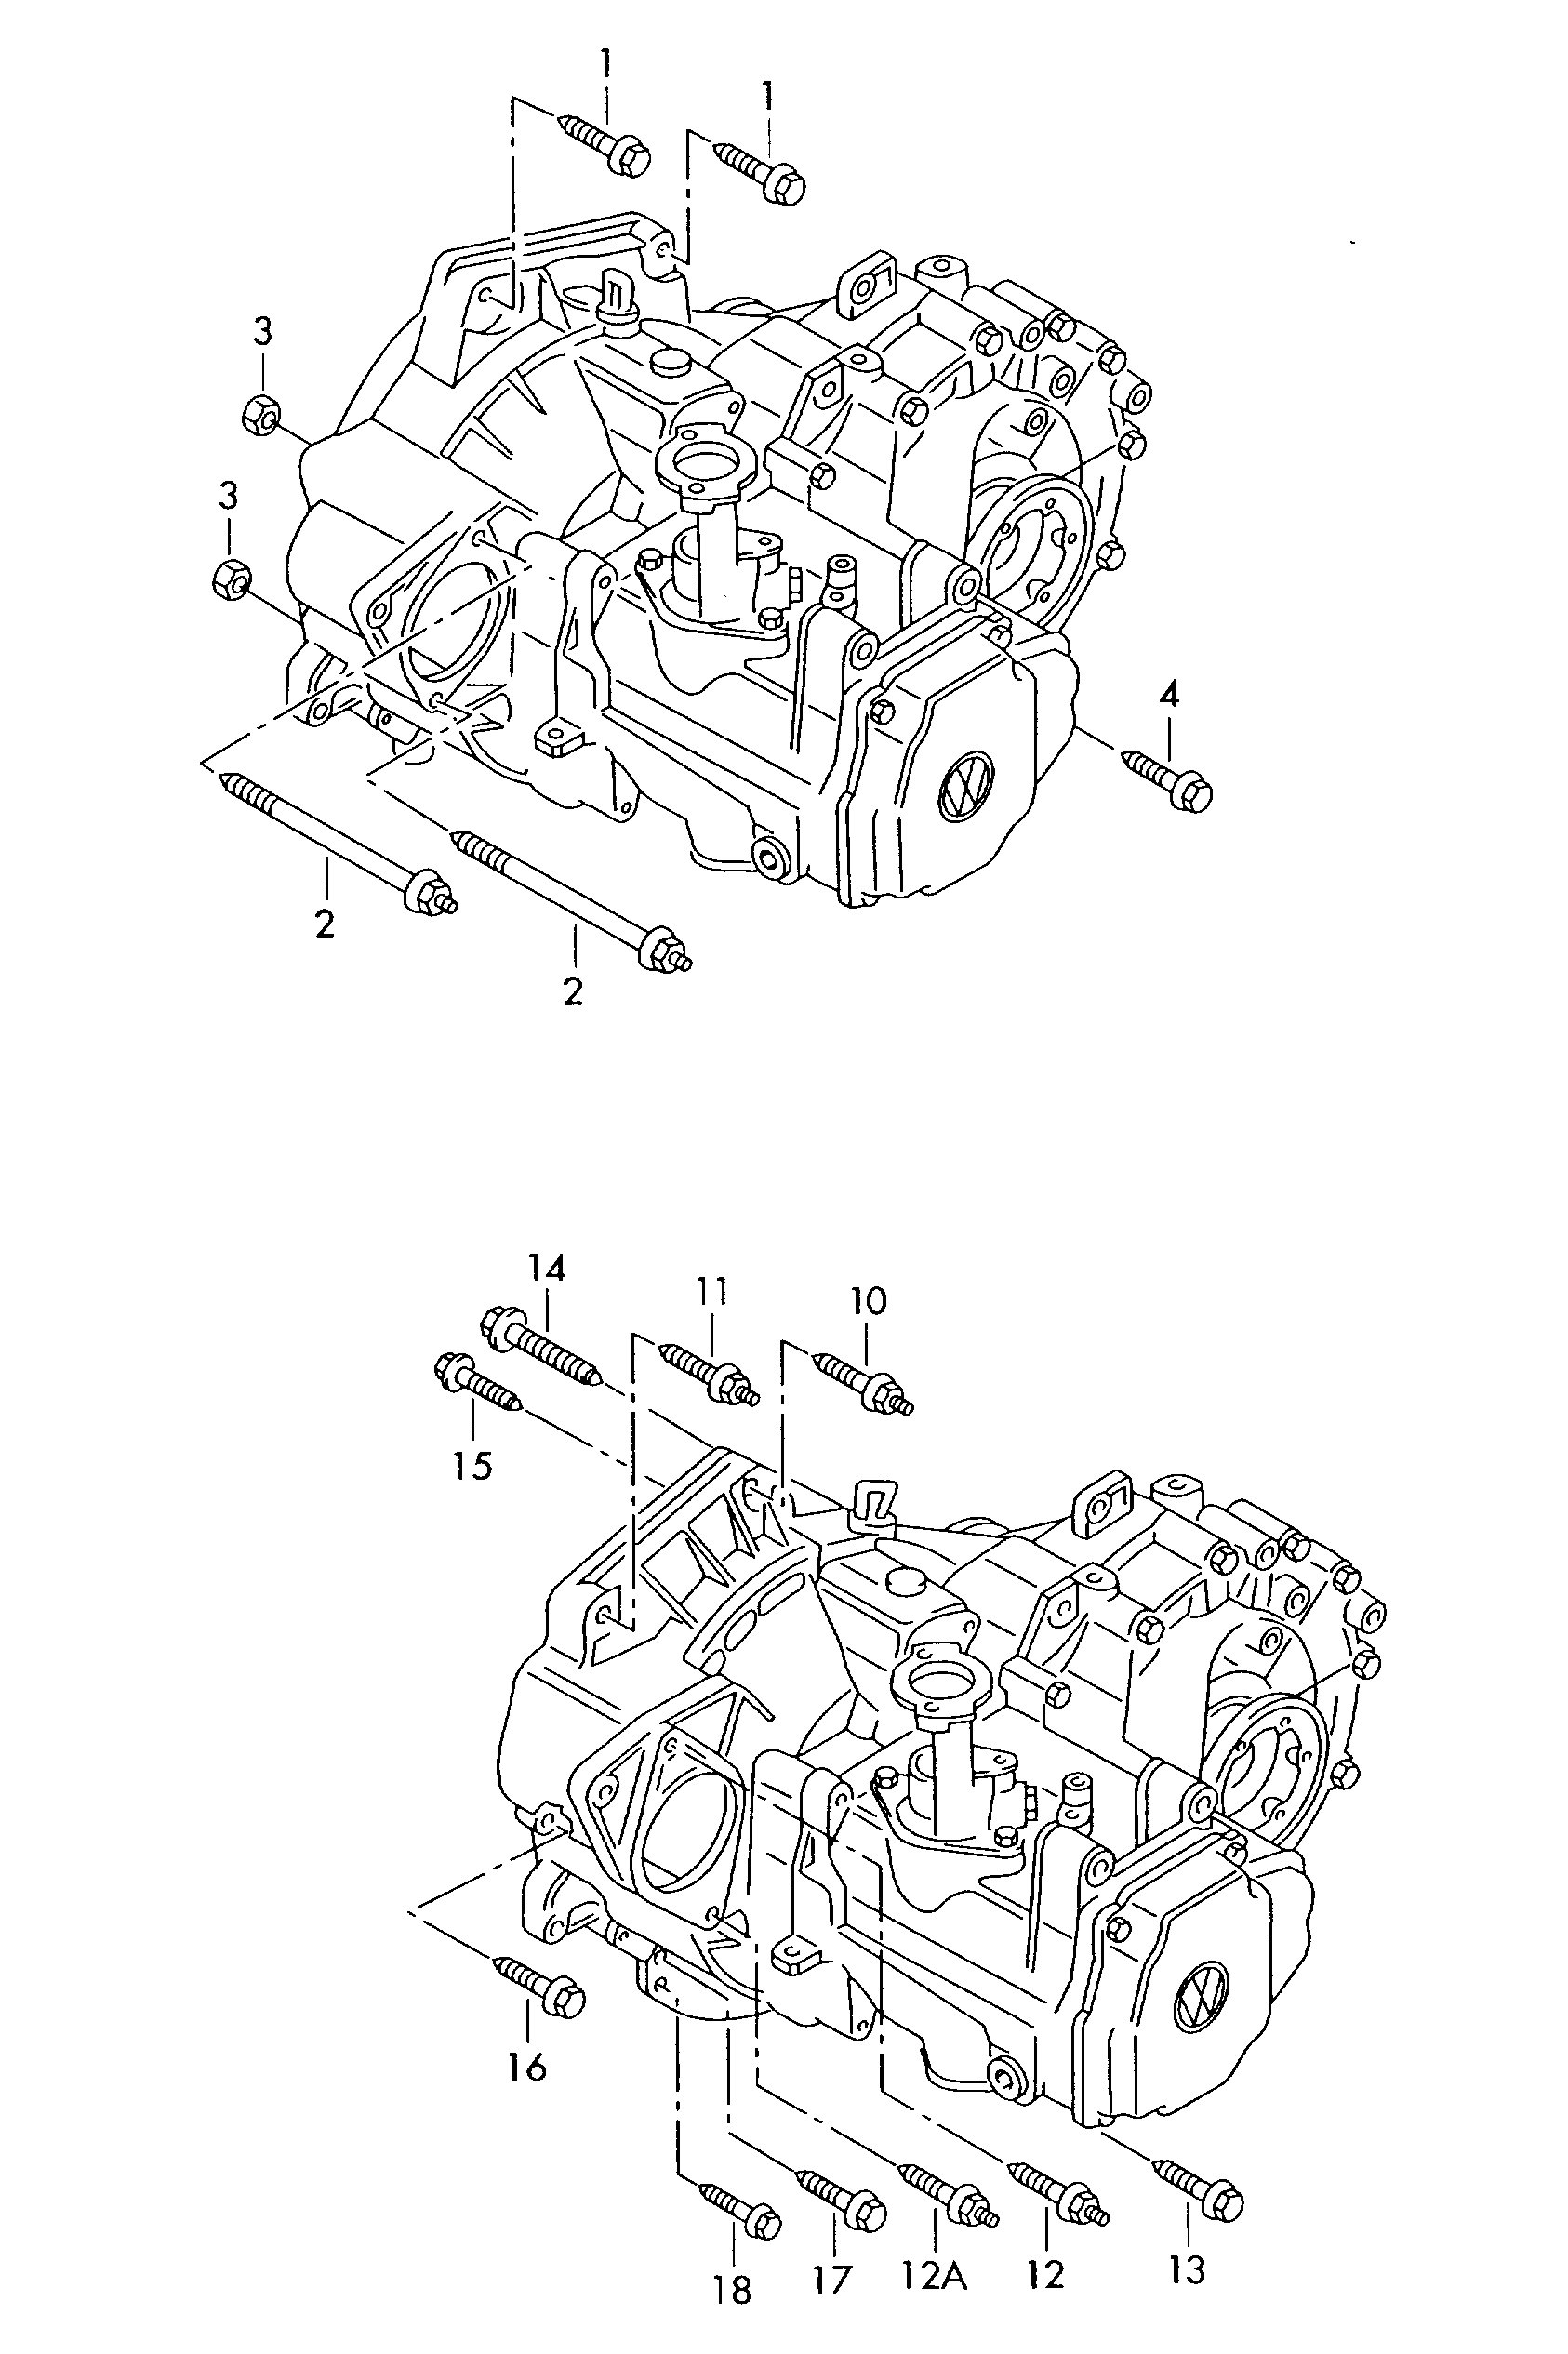 2002 Vw Jetta Parts Diagram